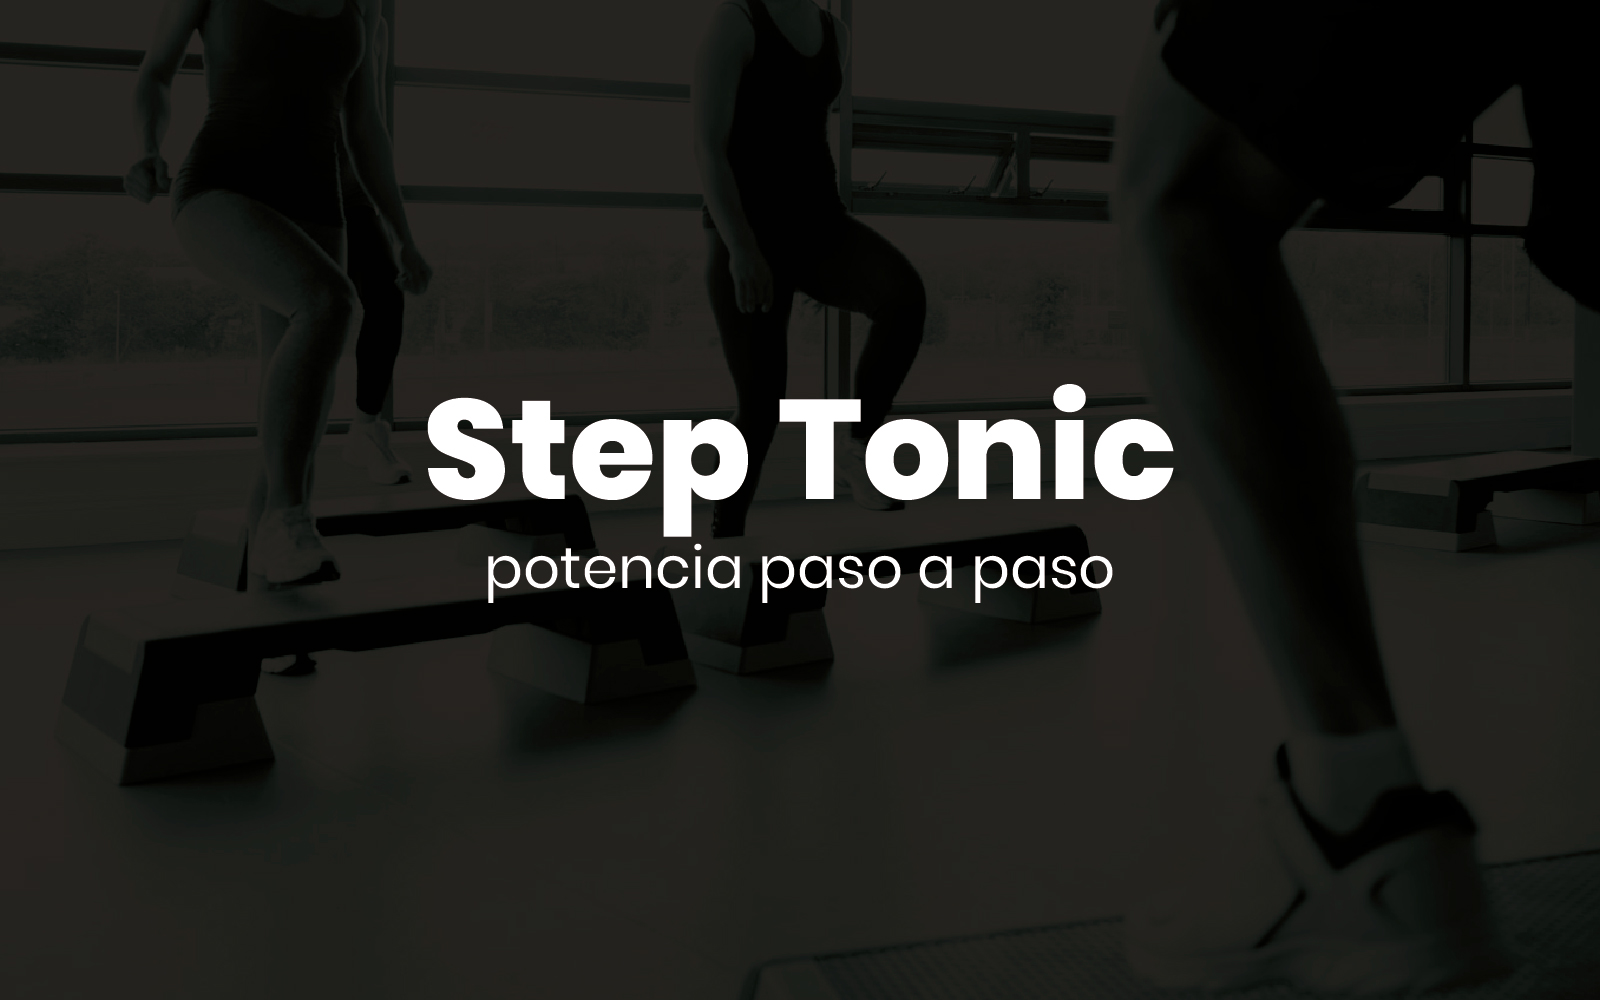 Step Tonic